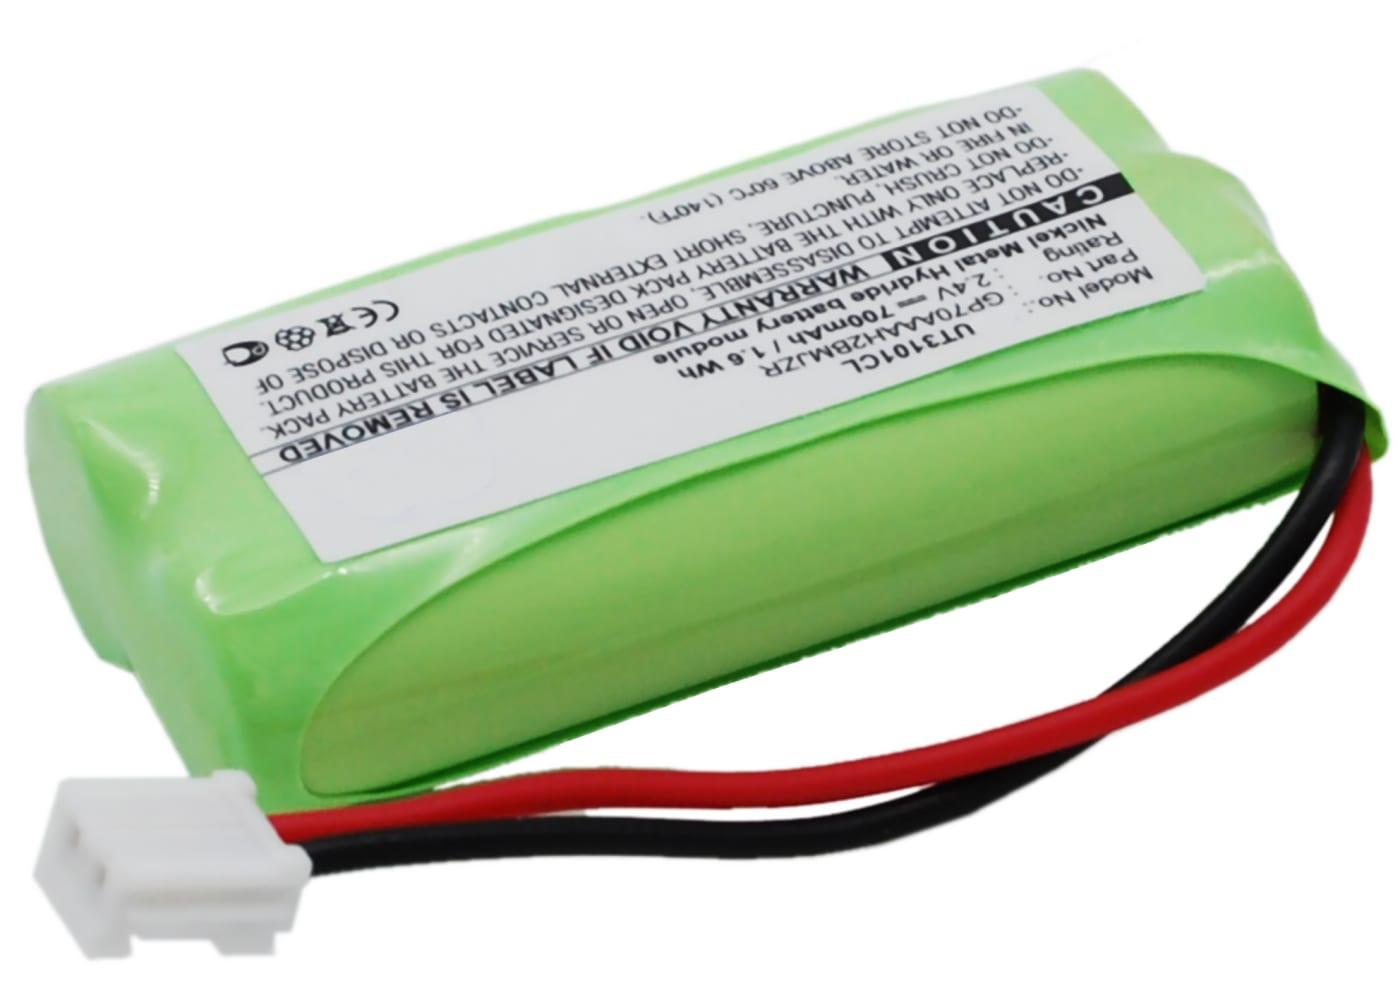 Batteria CPH-515D subtel® per cordless DeTeWe BeeTel 2000, General Electrics, Motorola B / L / K, Philips SJB, Uniden Elite / DECT, V Tech, Plantronics Calisto Pro Affidabile ricambio da 700mAh